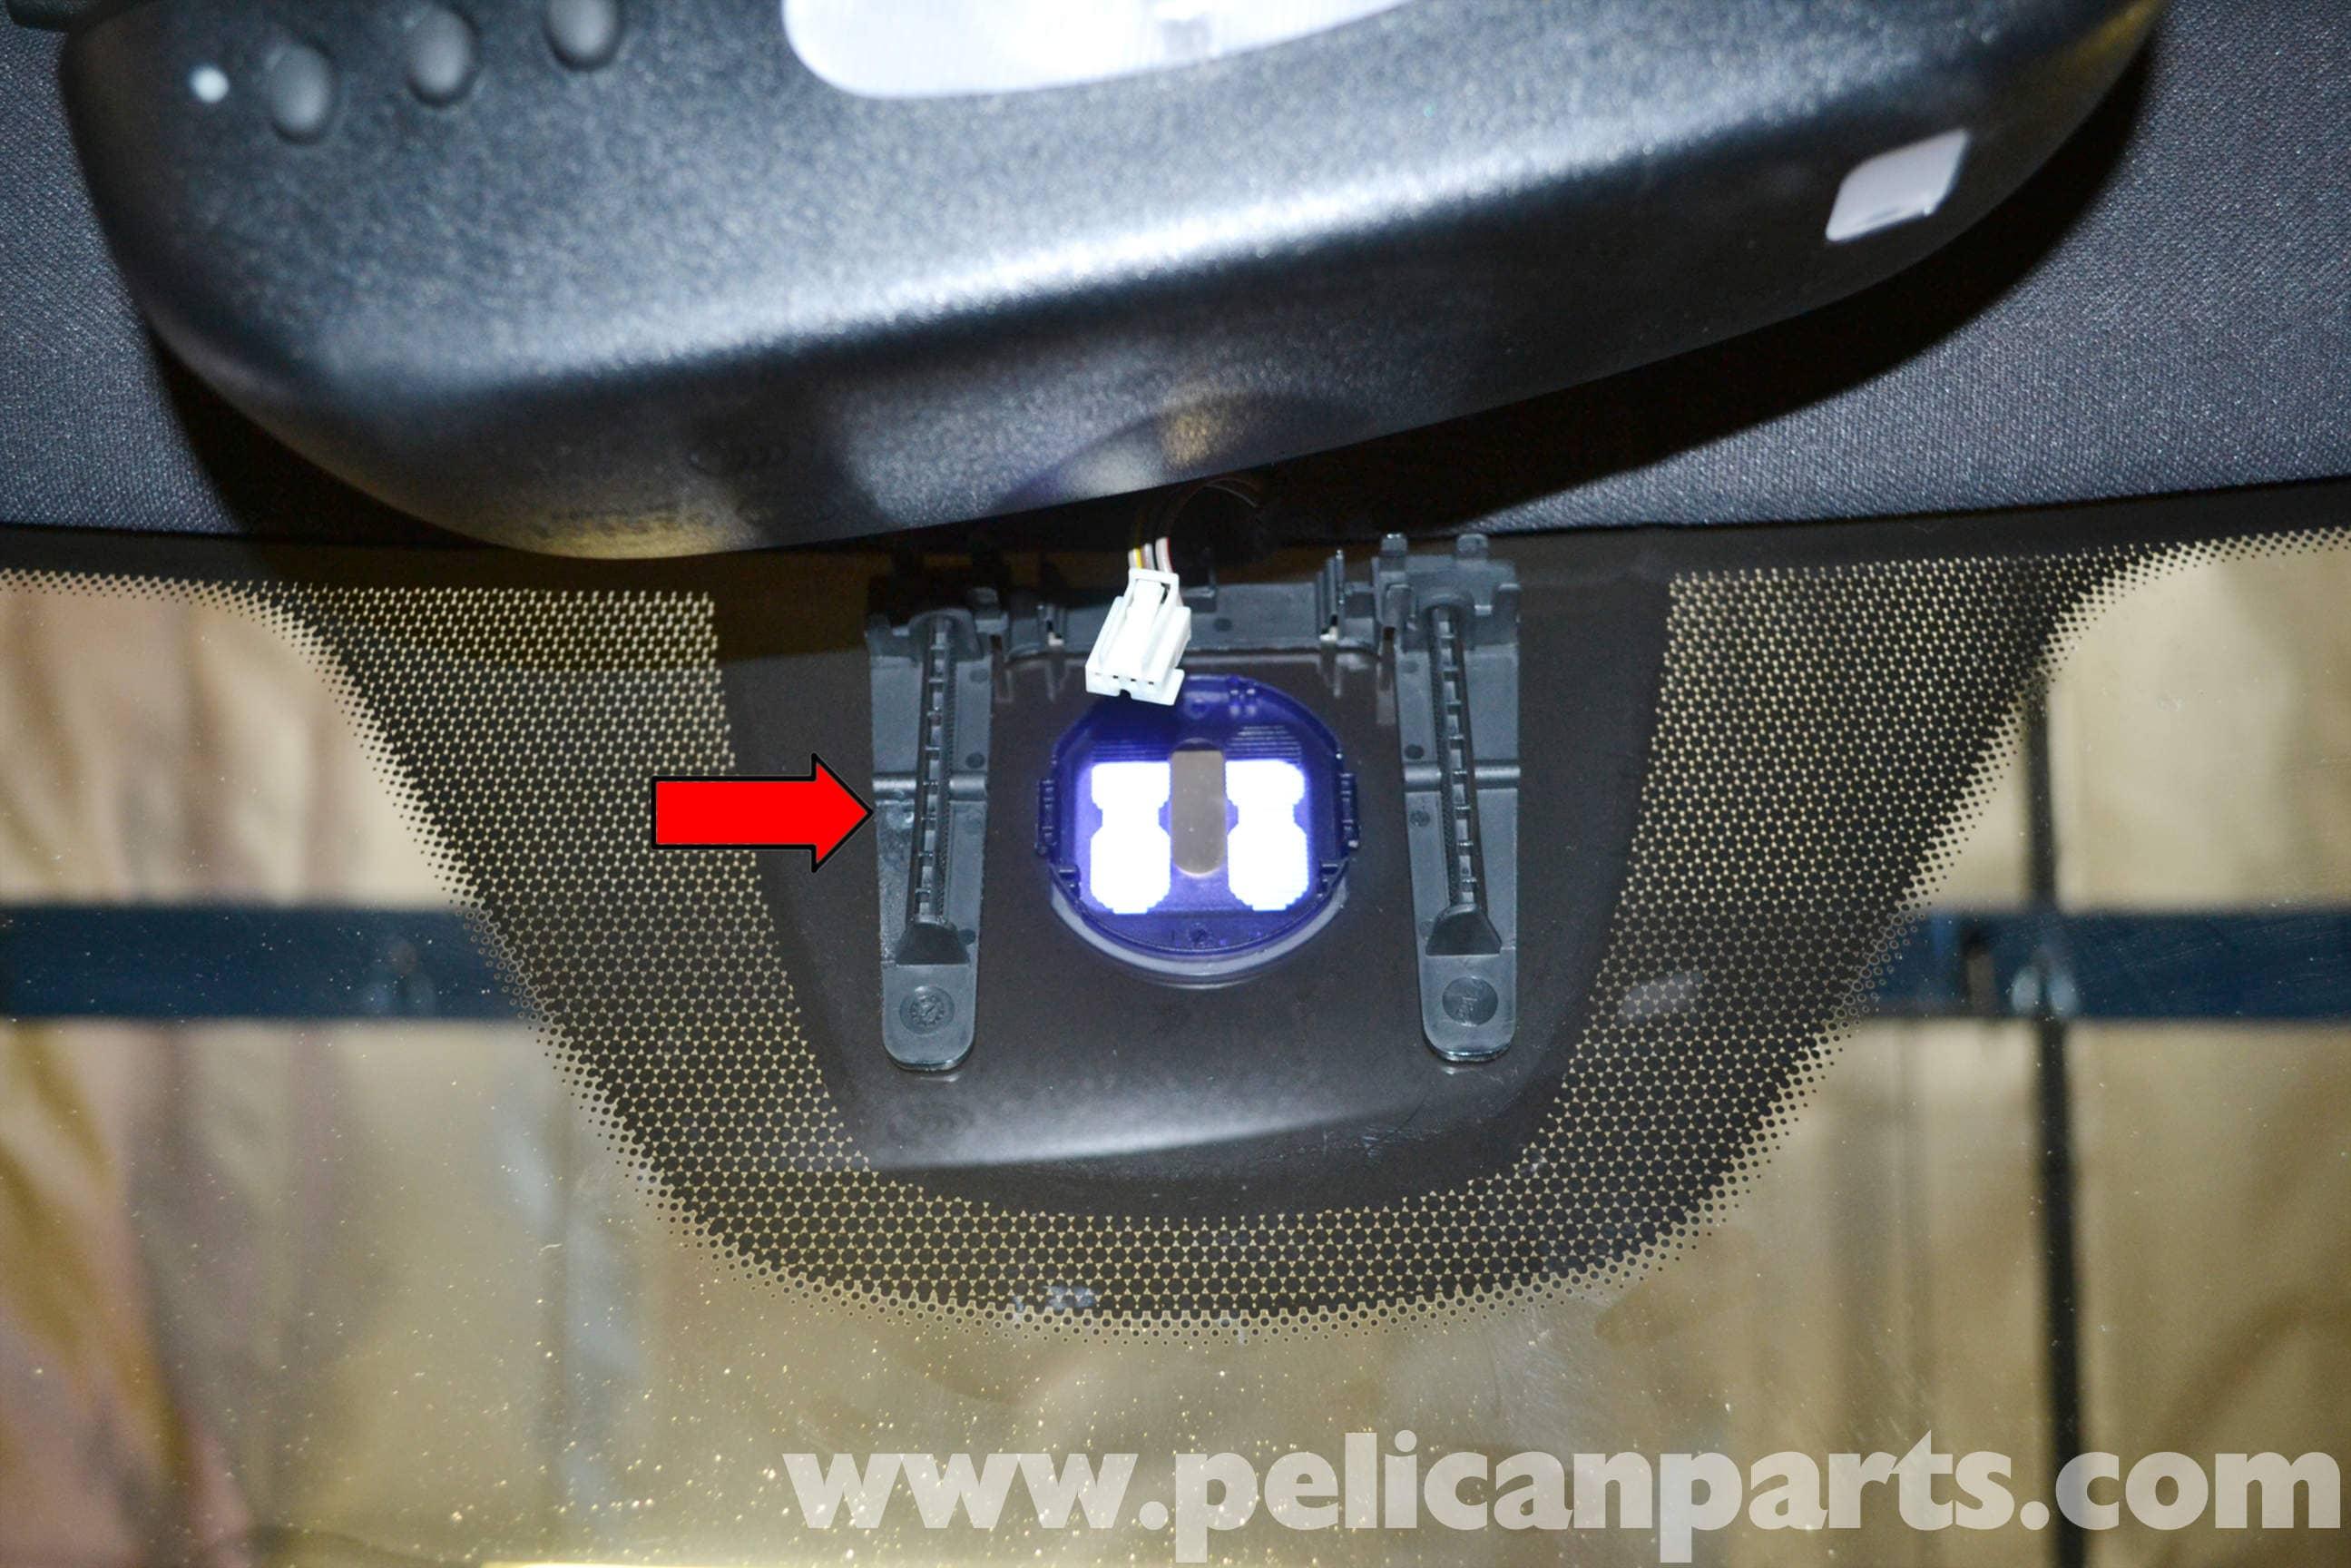 2013 Mercedes Benz C250 Coupe Fuse Box Diagram Mercedes Benz W204 Rain And Light Sensor Replacement